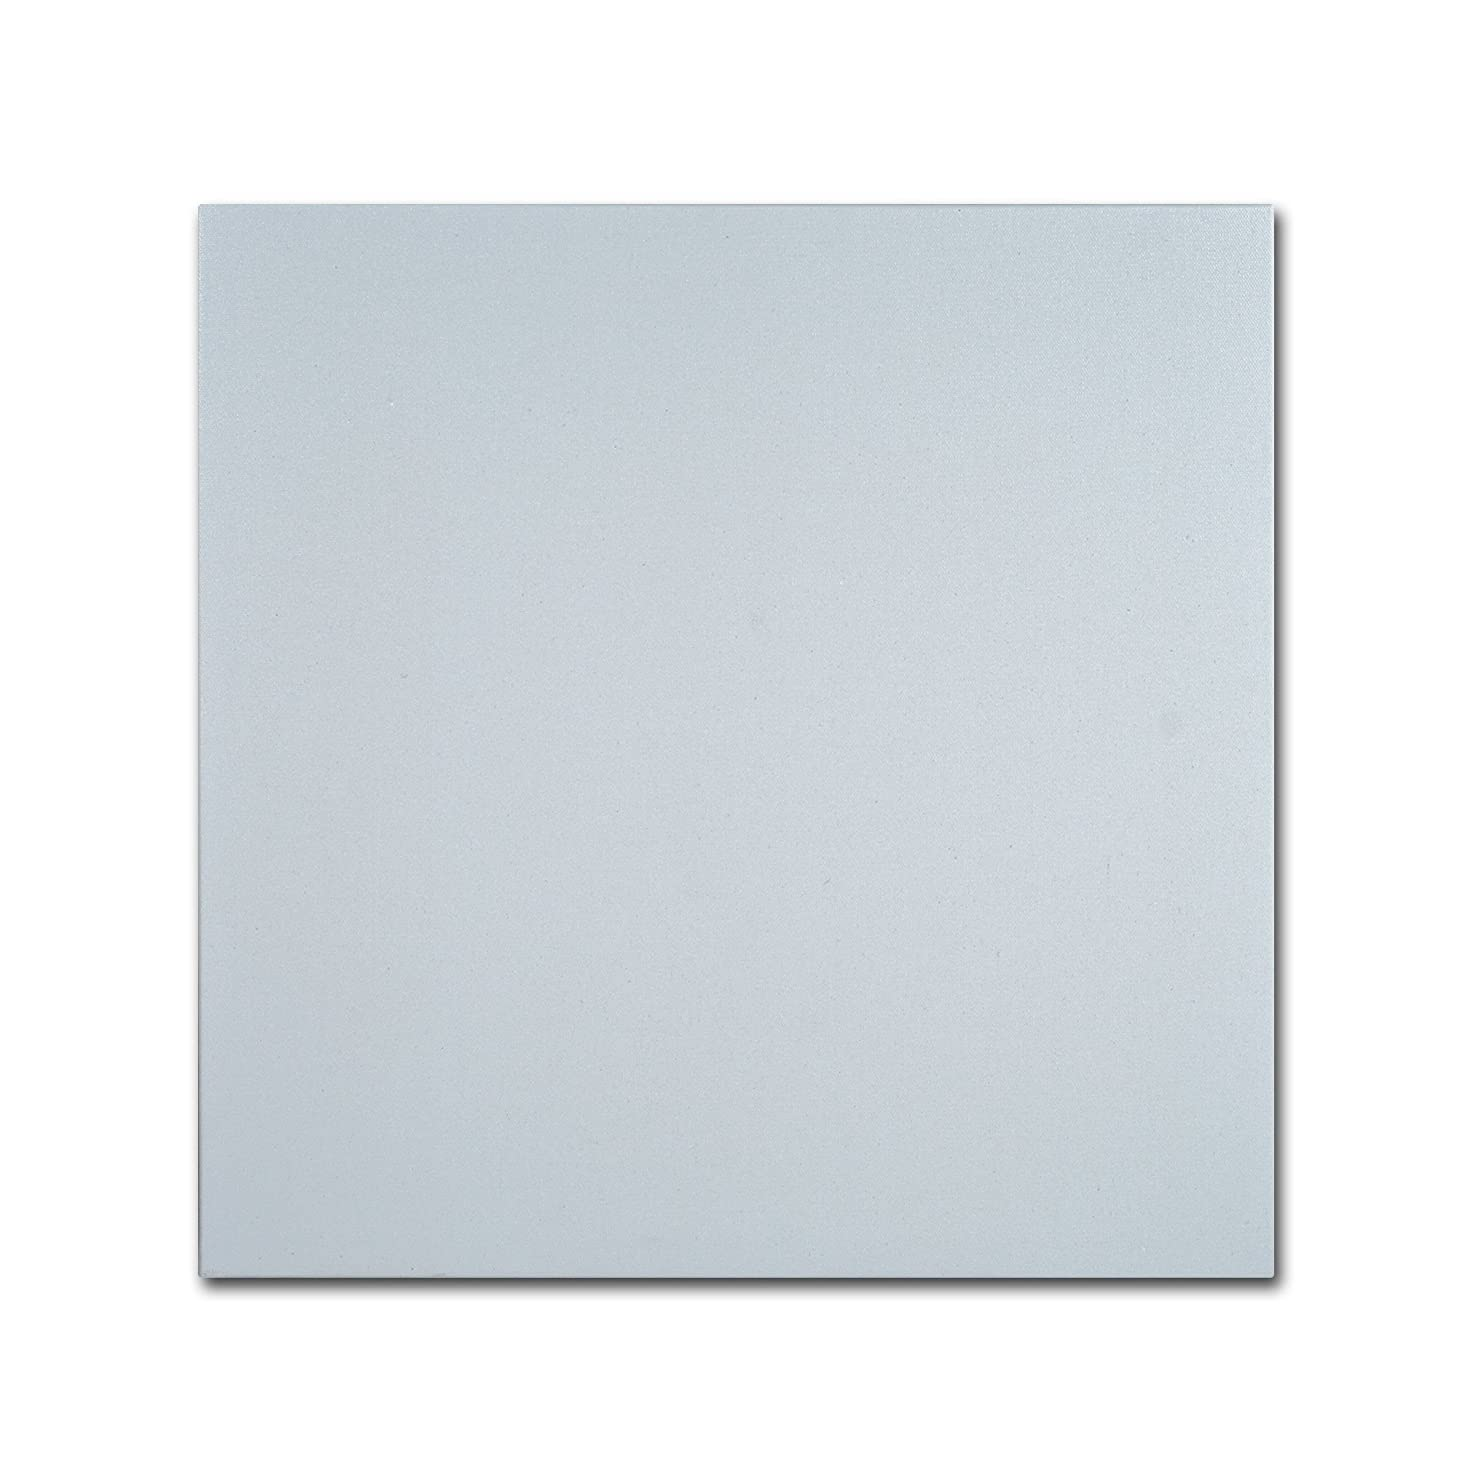 Trademark Fine Art Professional Blank Canvas on Stretcher Bars, 24